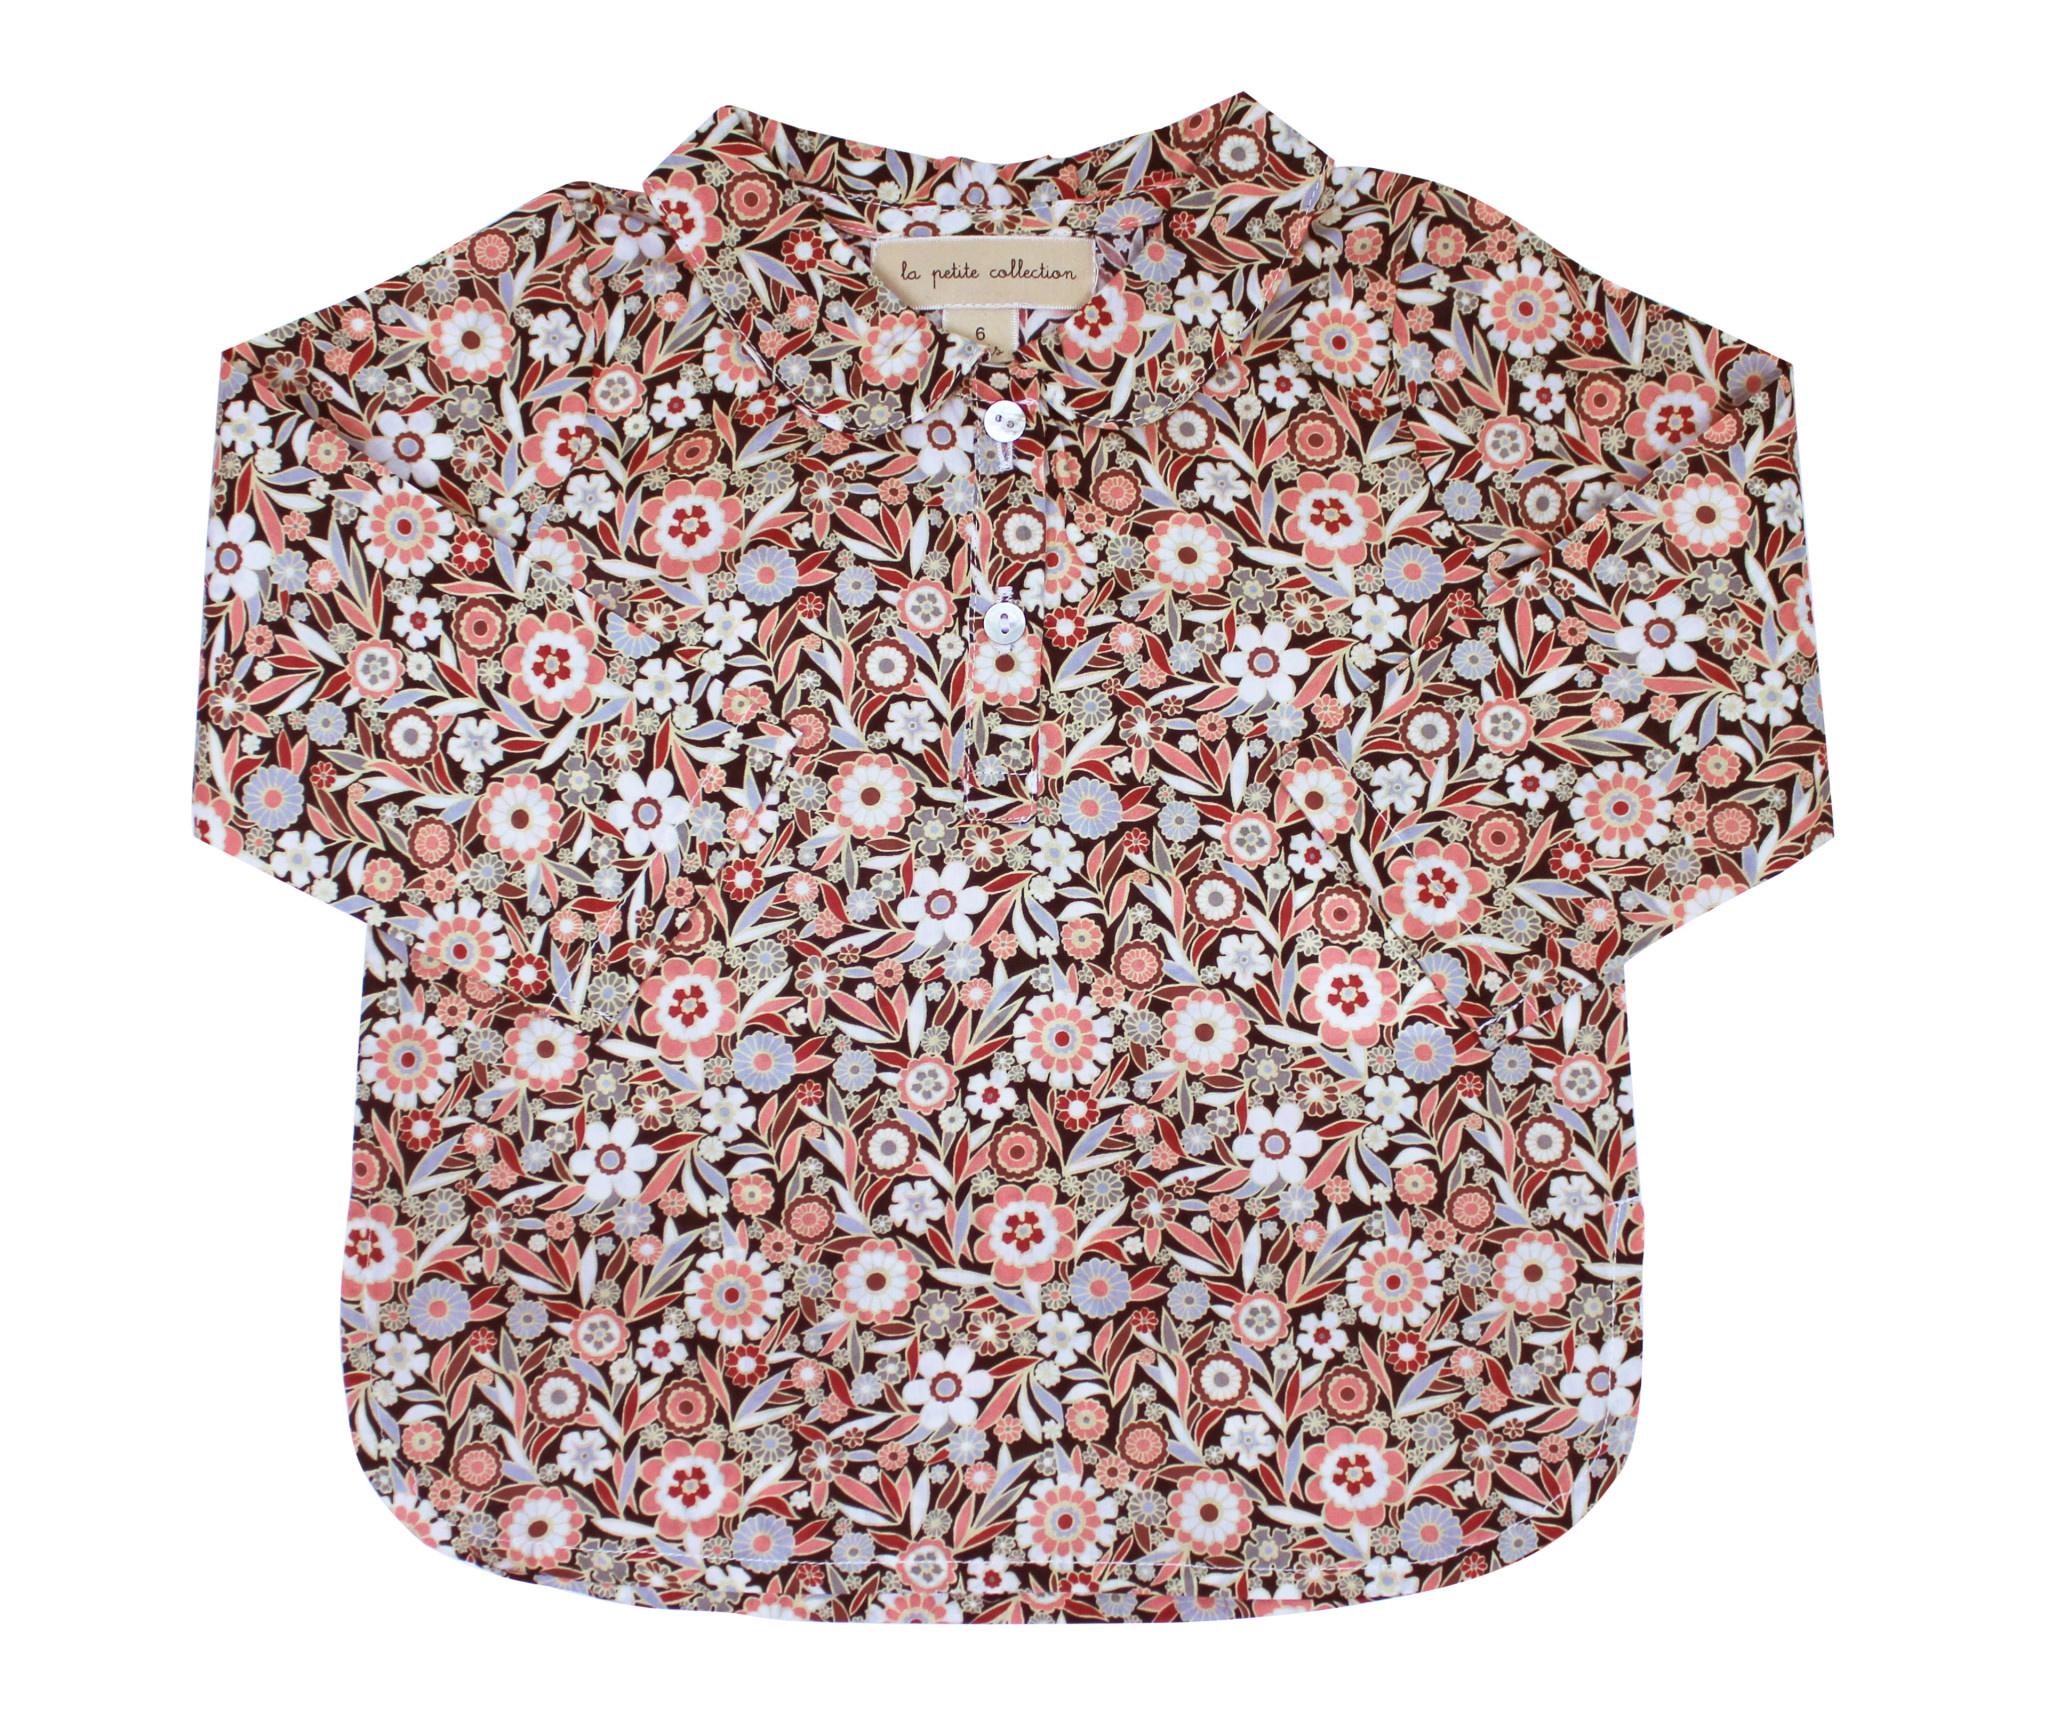 la petite collection Claudine Shirt Operetta